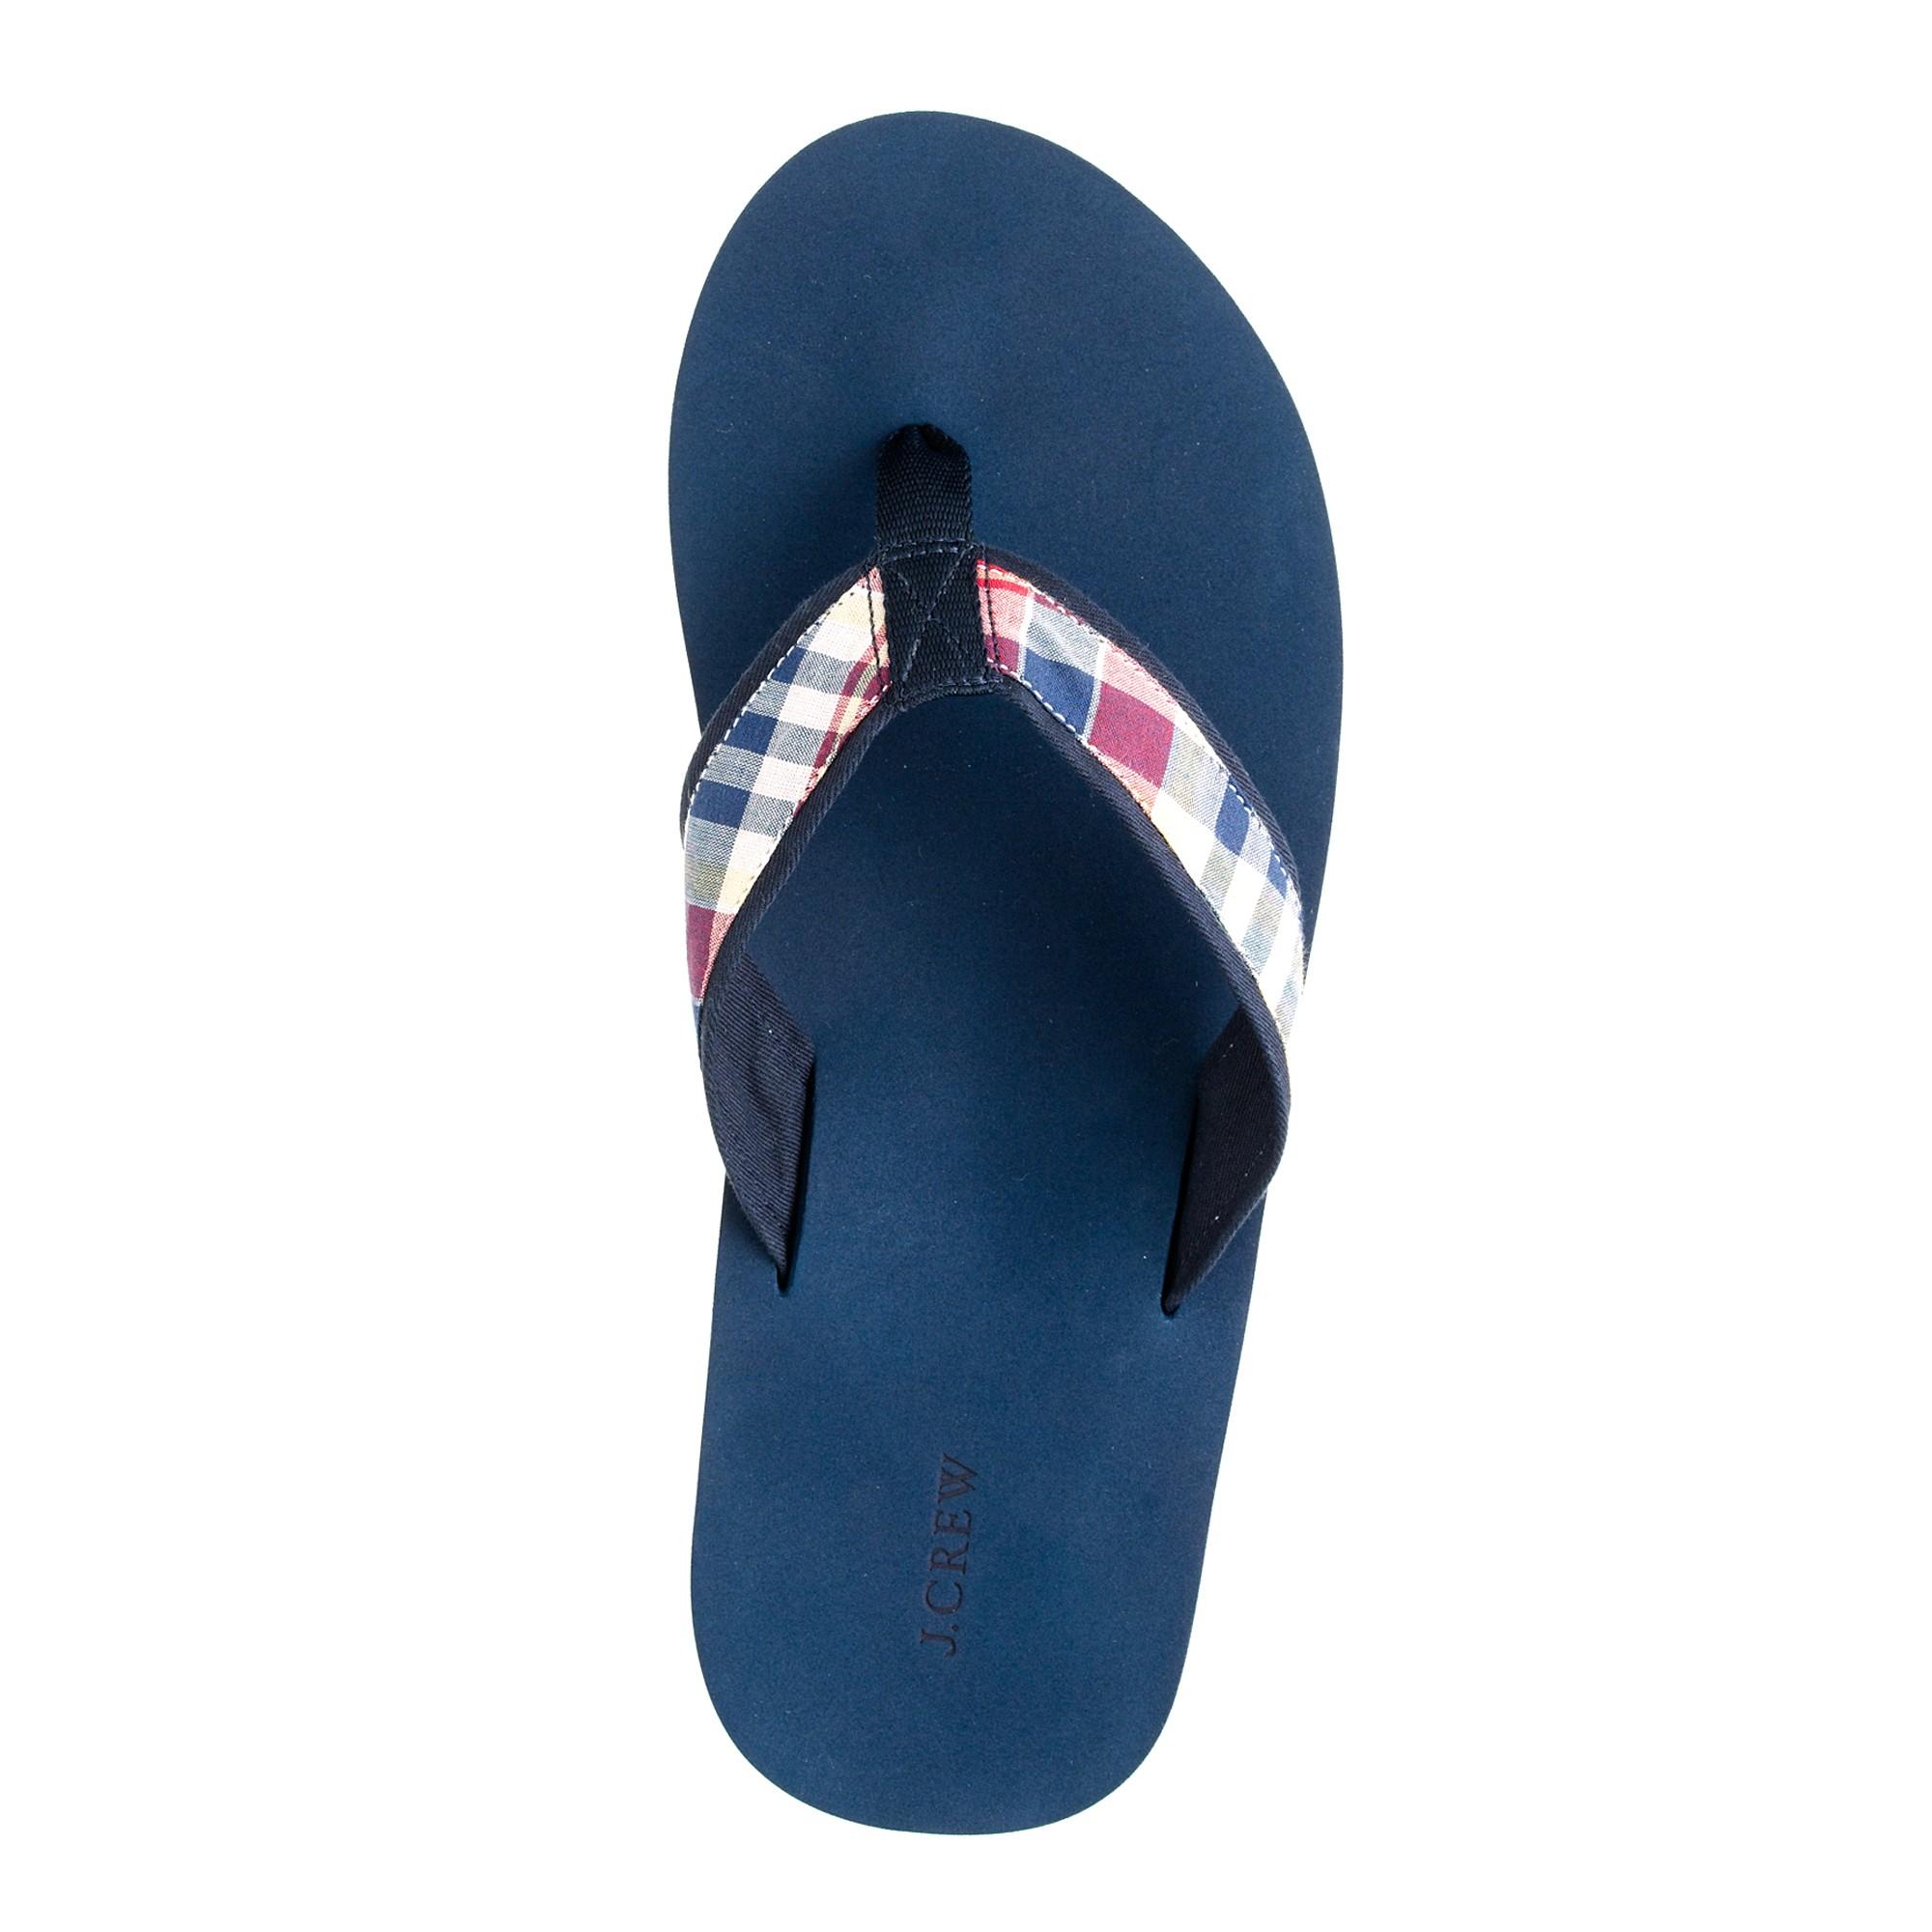 J Crew Indian Cotton Summer Plaid Flip Flops In Blue For